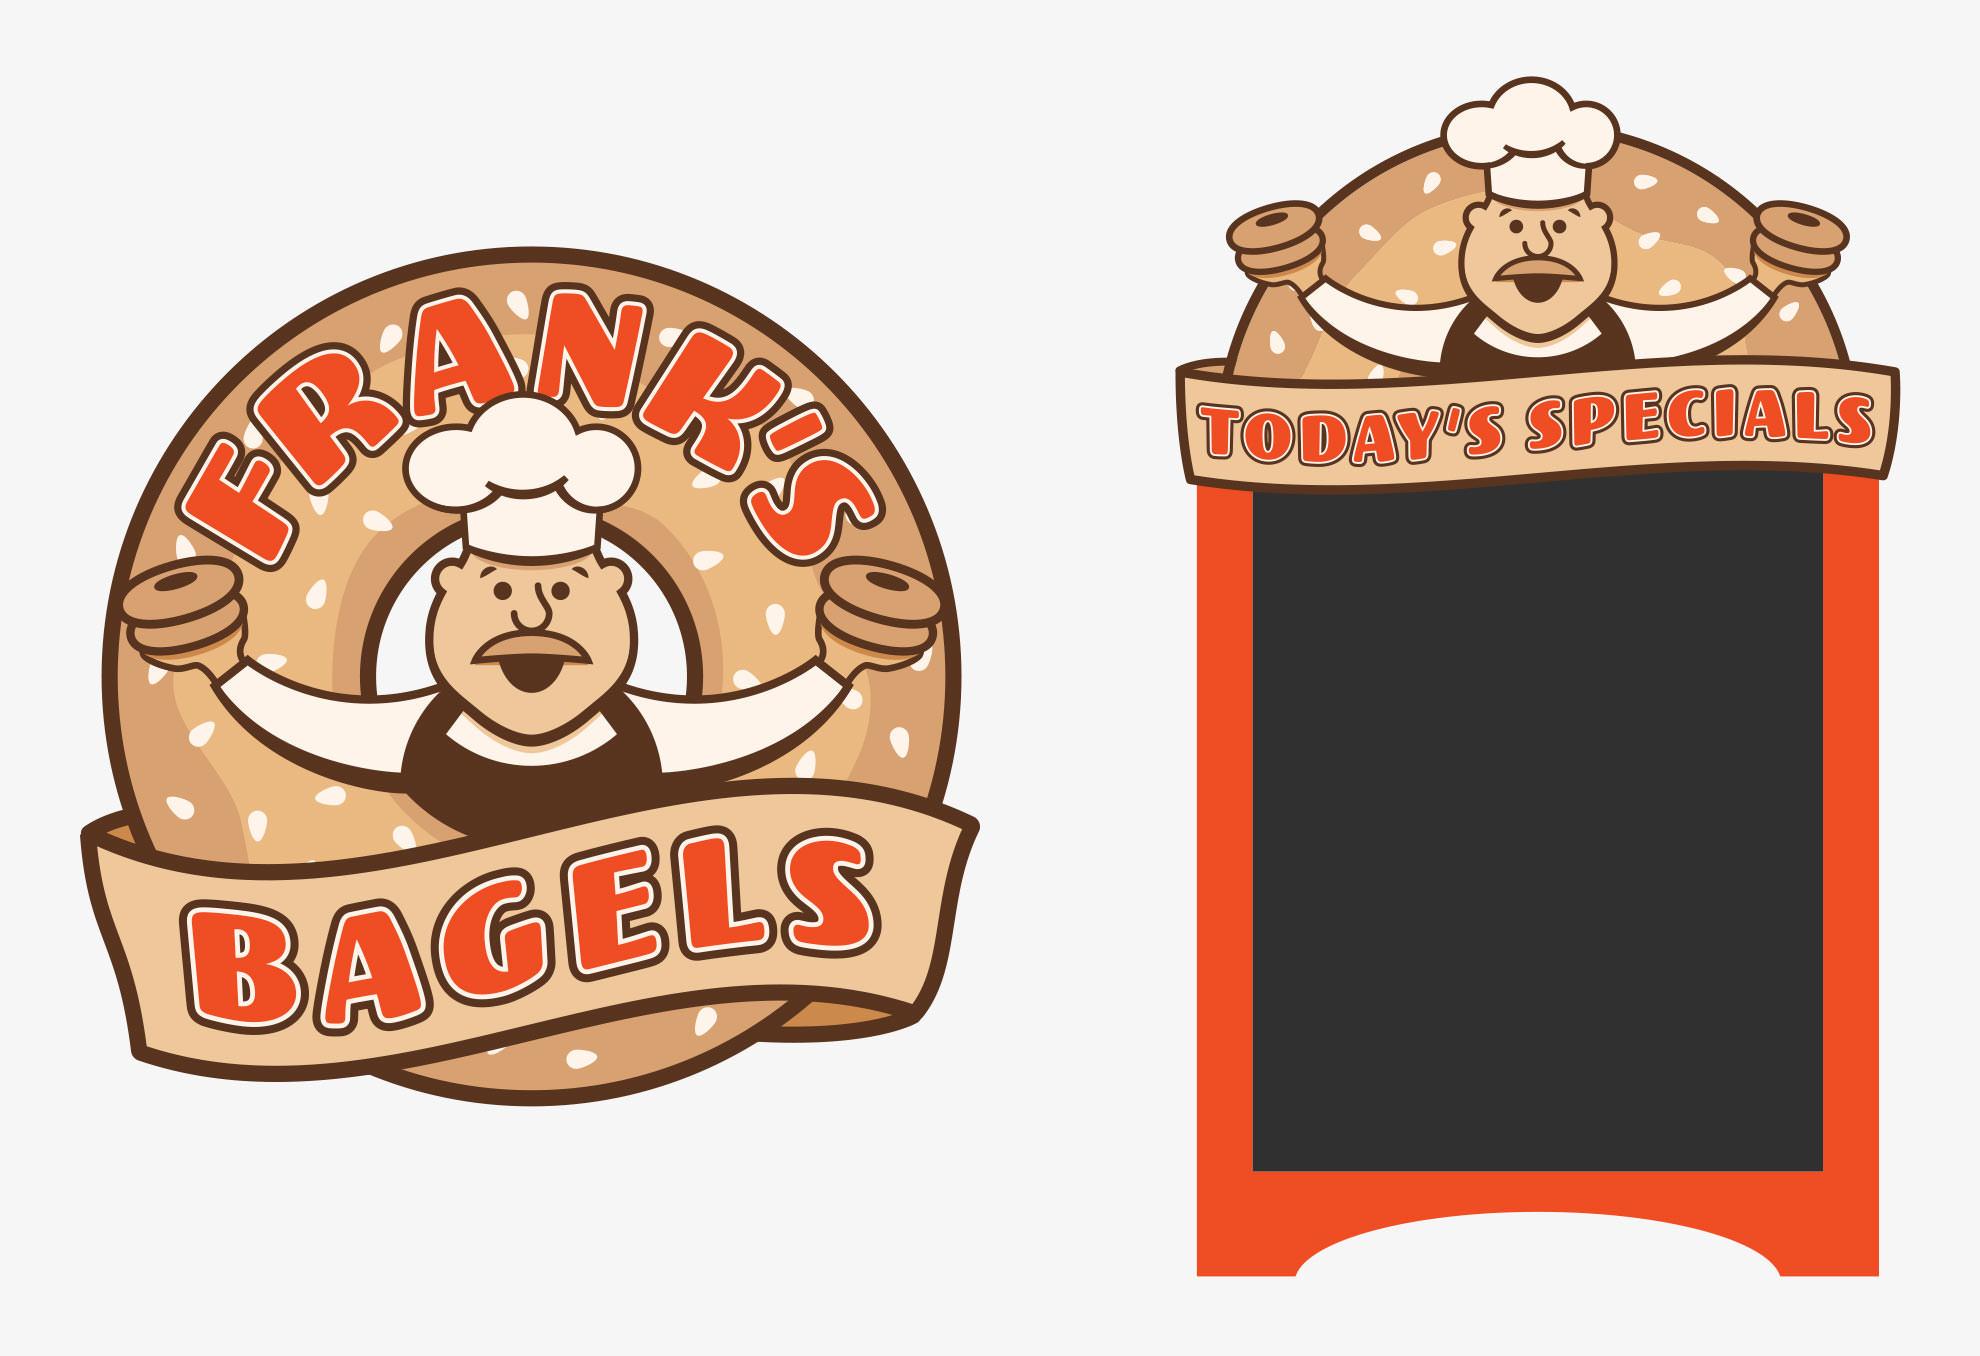 Grace and Frankie Season 3 Bagel Shop Signage